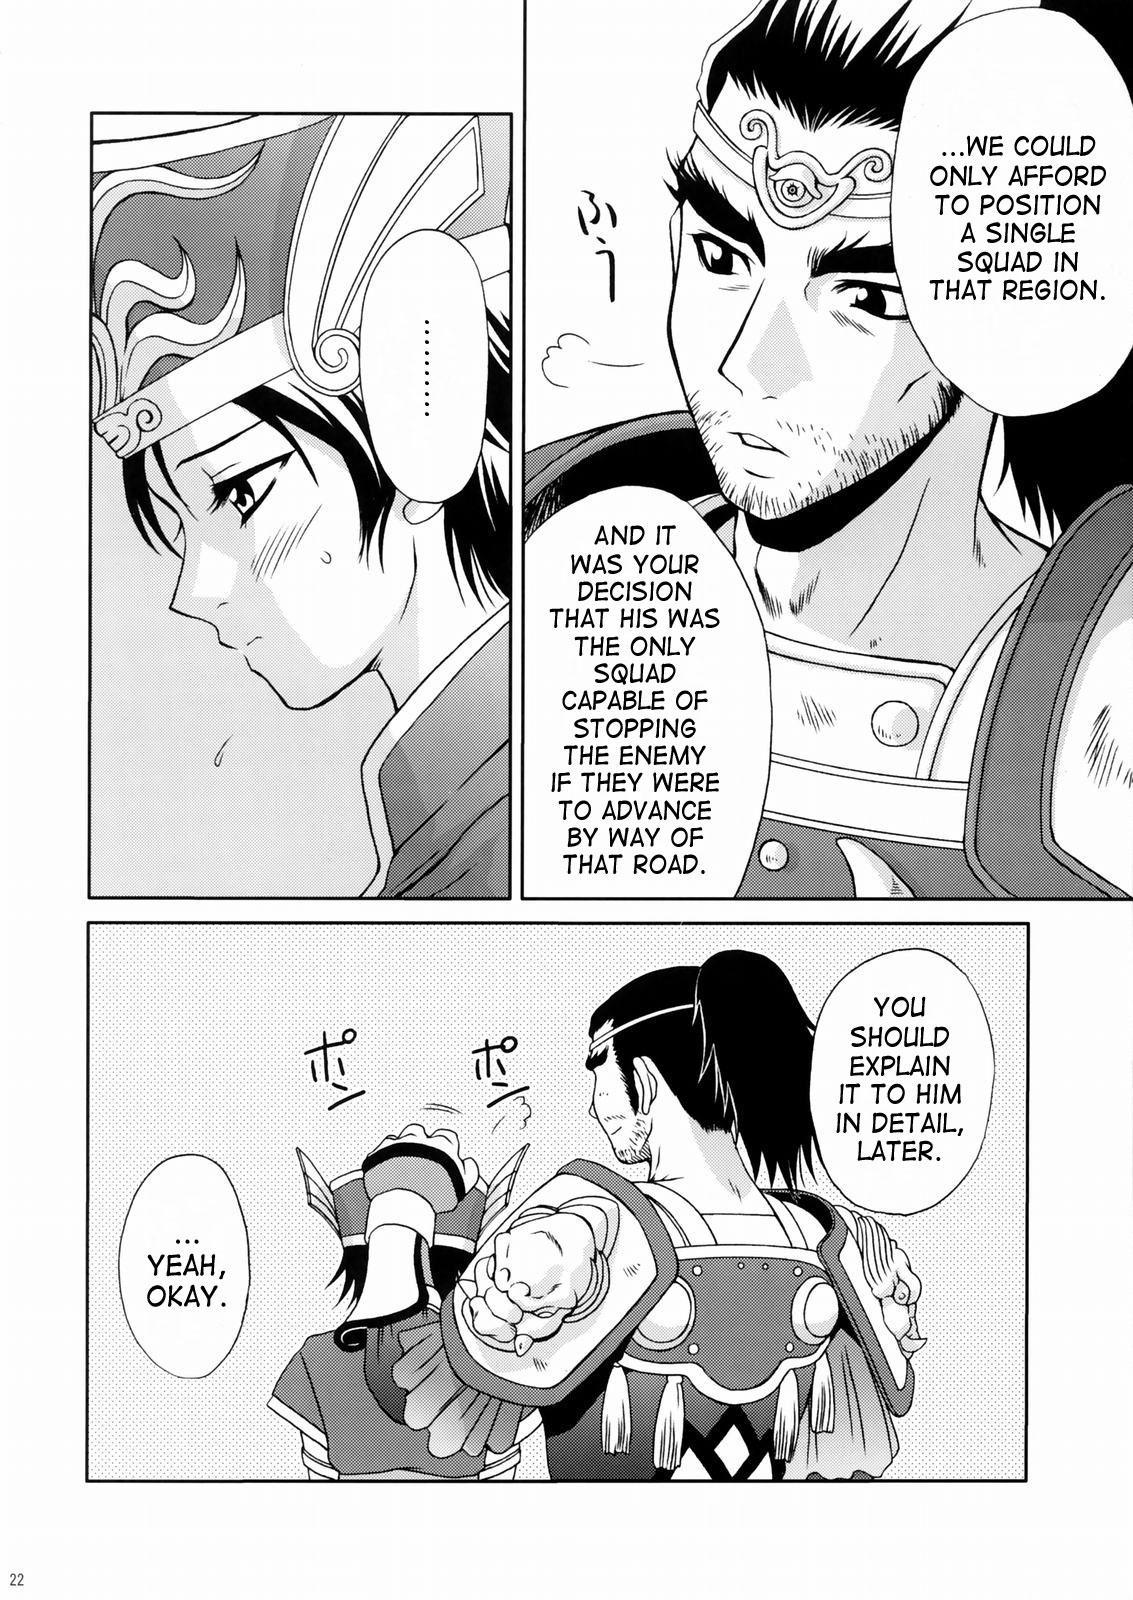 (C66) [U.R.C (Momoya Show-Neko)] Rikuson-chan ~Lovely Gunshi no Himitsu~ | Rikuson-chan Secret of The Lovely Strategist (Dynasty Warriors) [English] [SaHa] 20